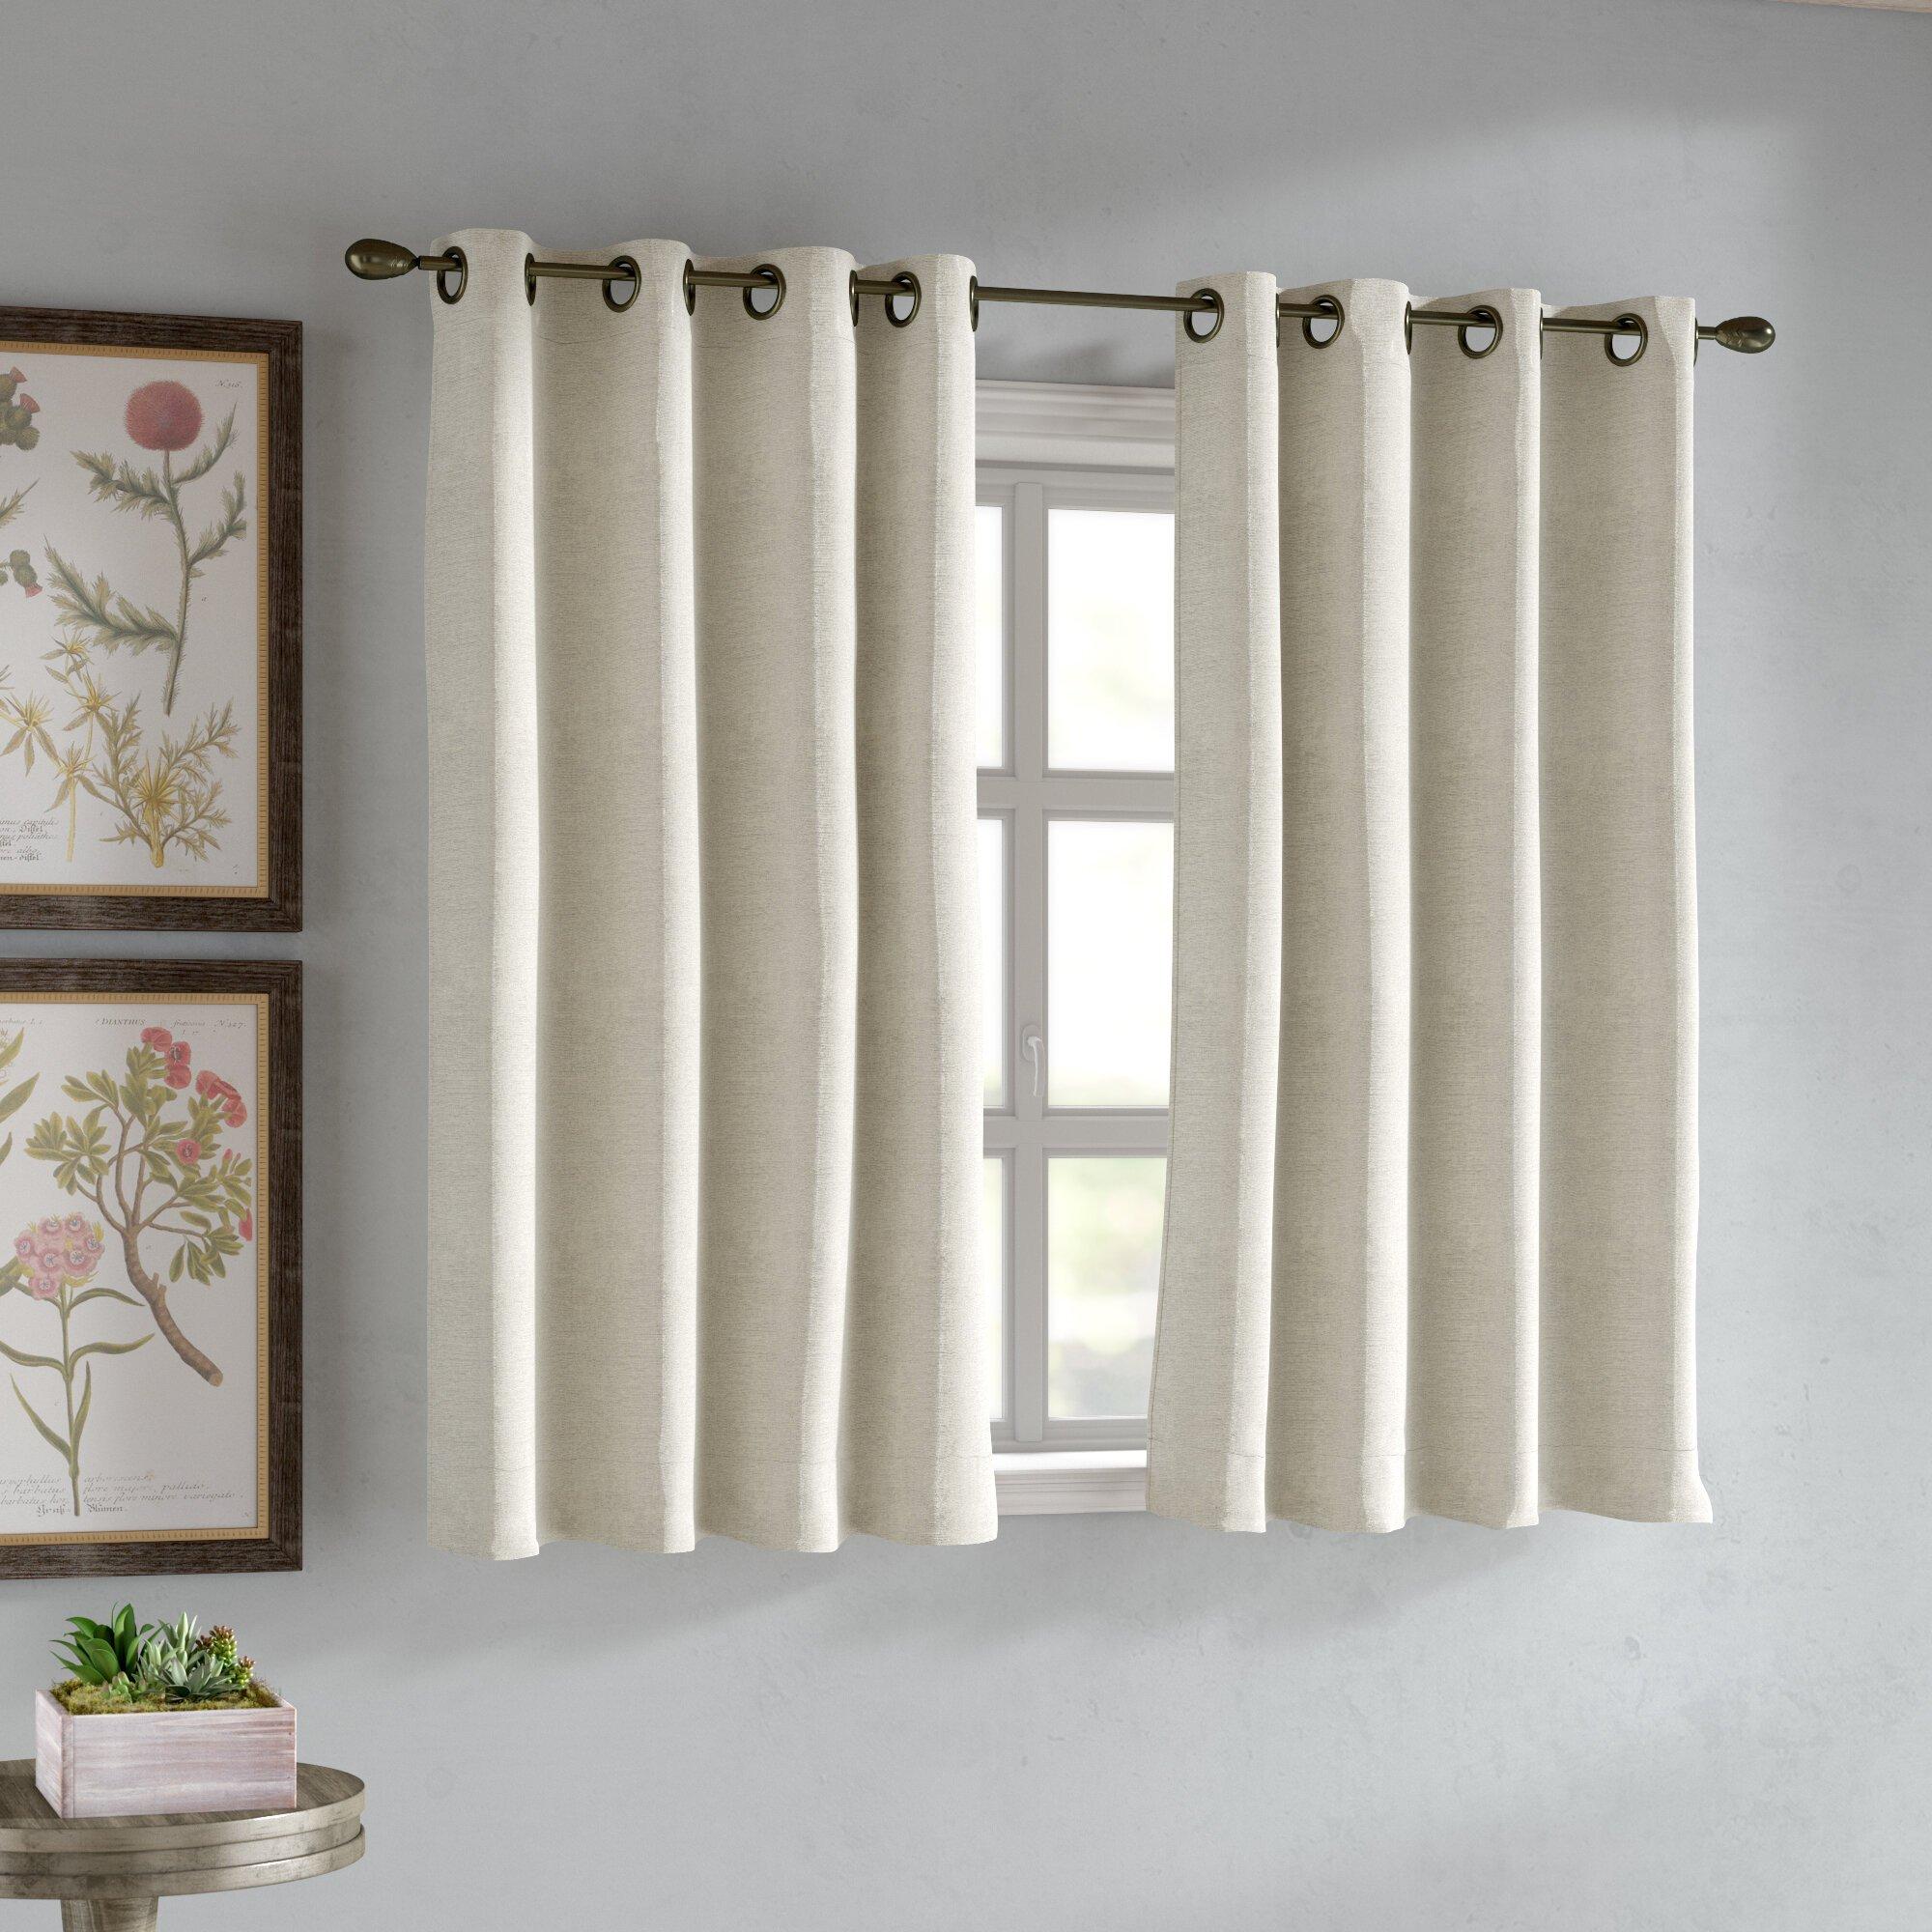 Short Curtains for Bedroom Windows Inspirational Gleason Short solid Room Darkening Grommet Single Curtain Panel